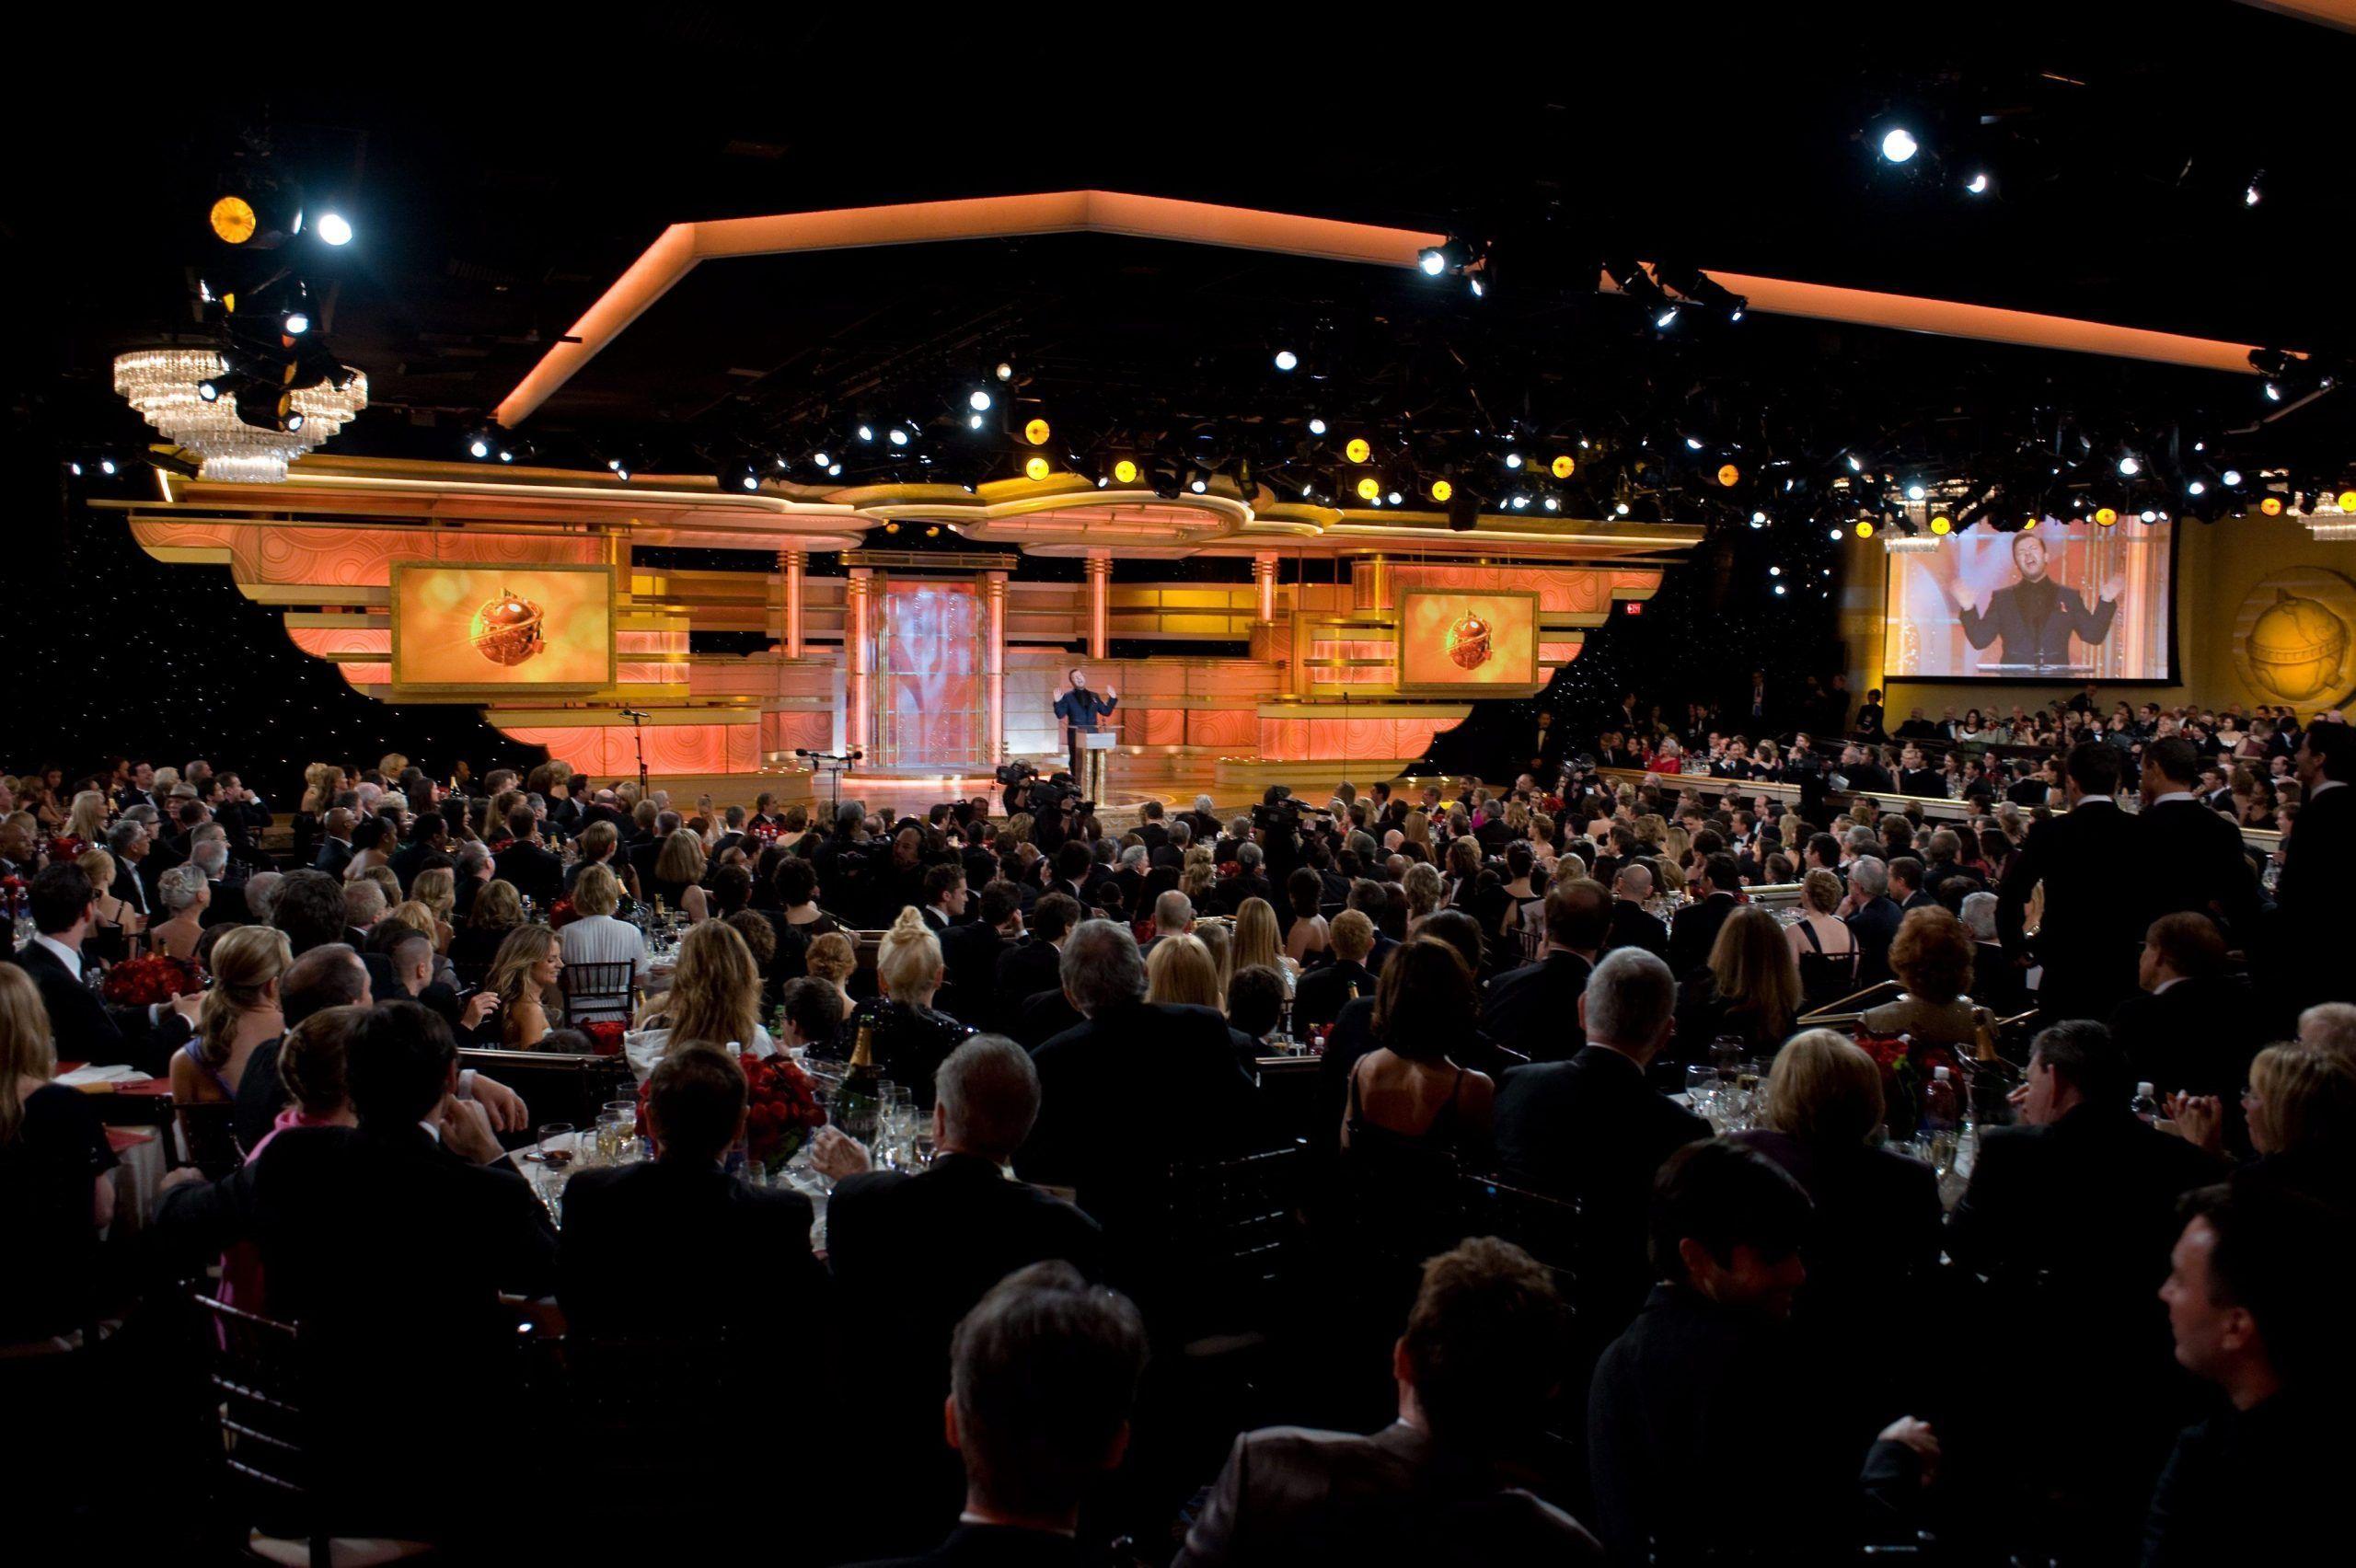 67th Golden Globe Awards Ceremony